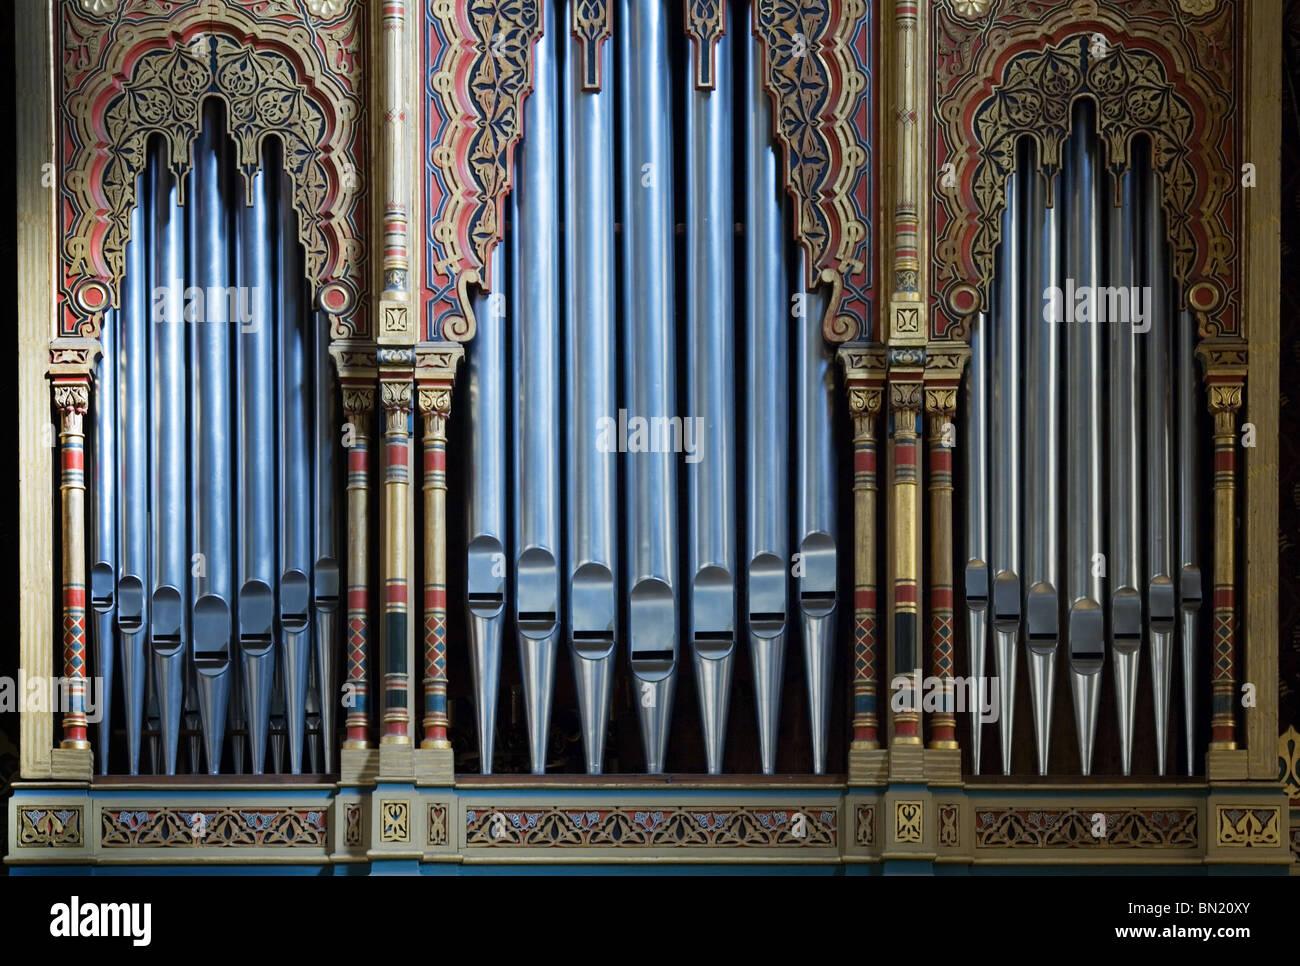 Spanish Pipe Organ, Prague - Stock Image